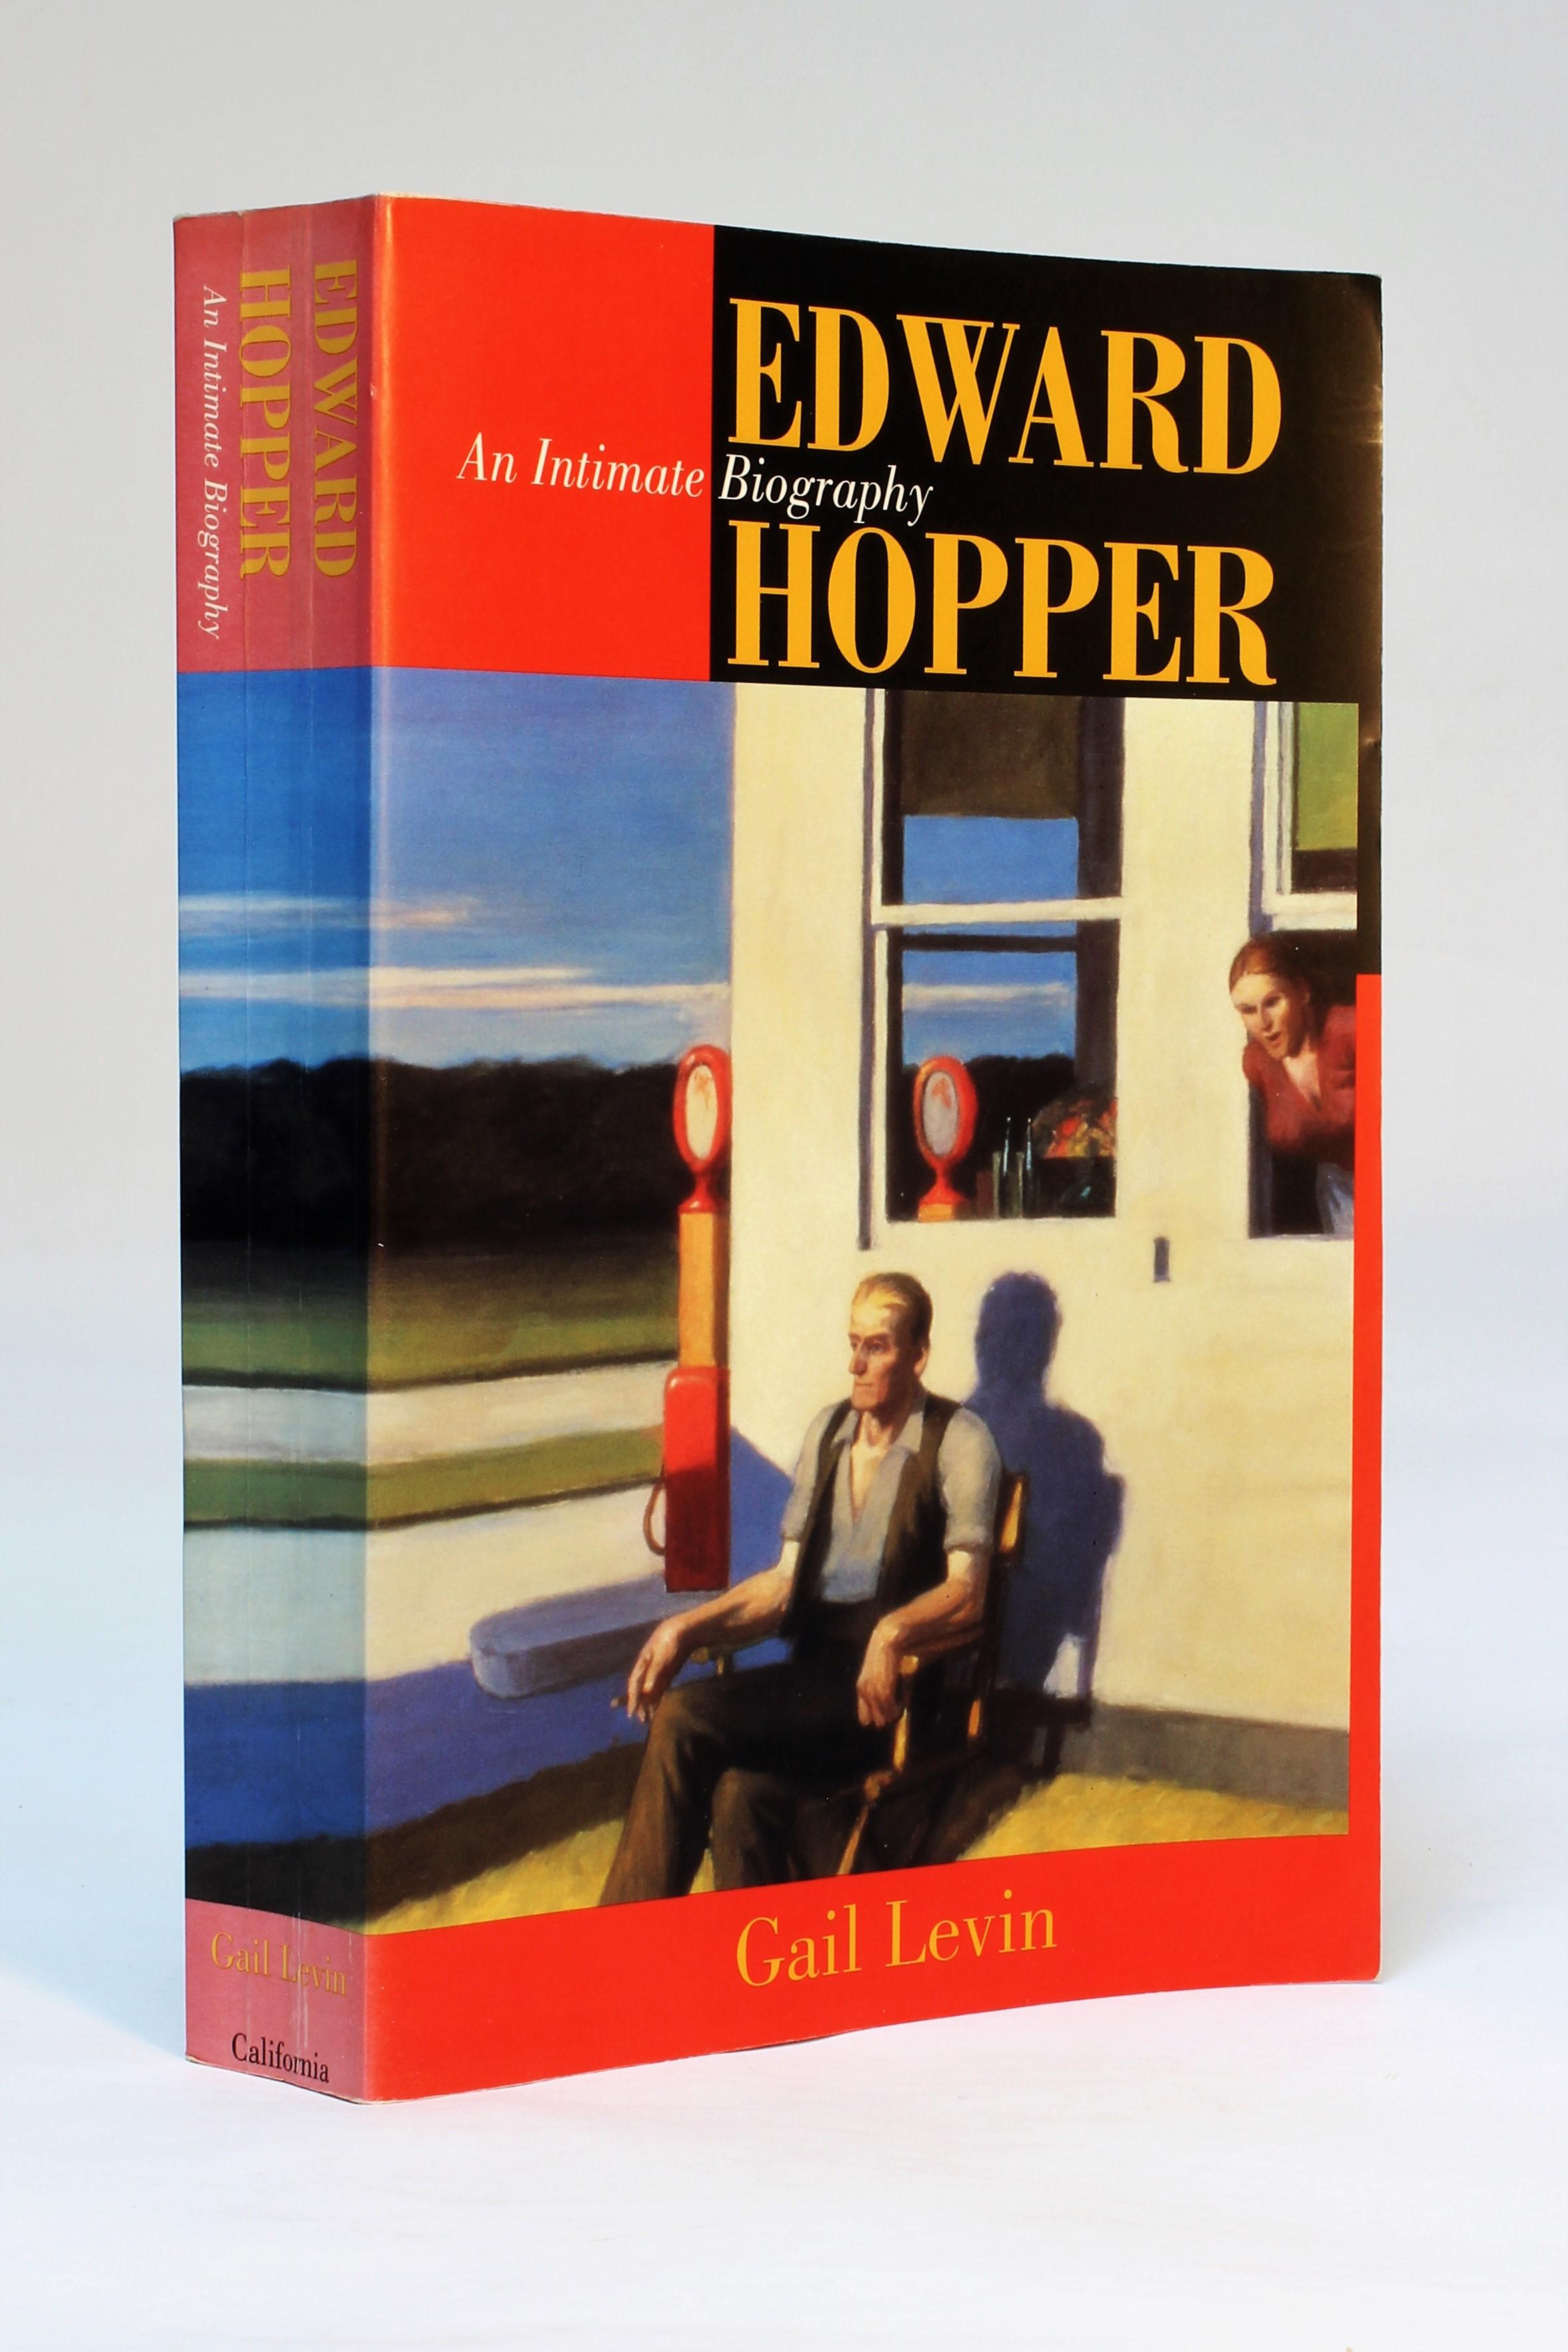 Edward Hopper: An Intimate Biography - Gail Levin